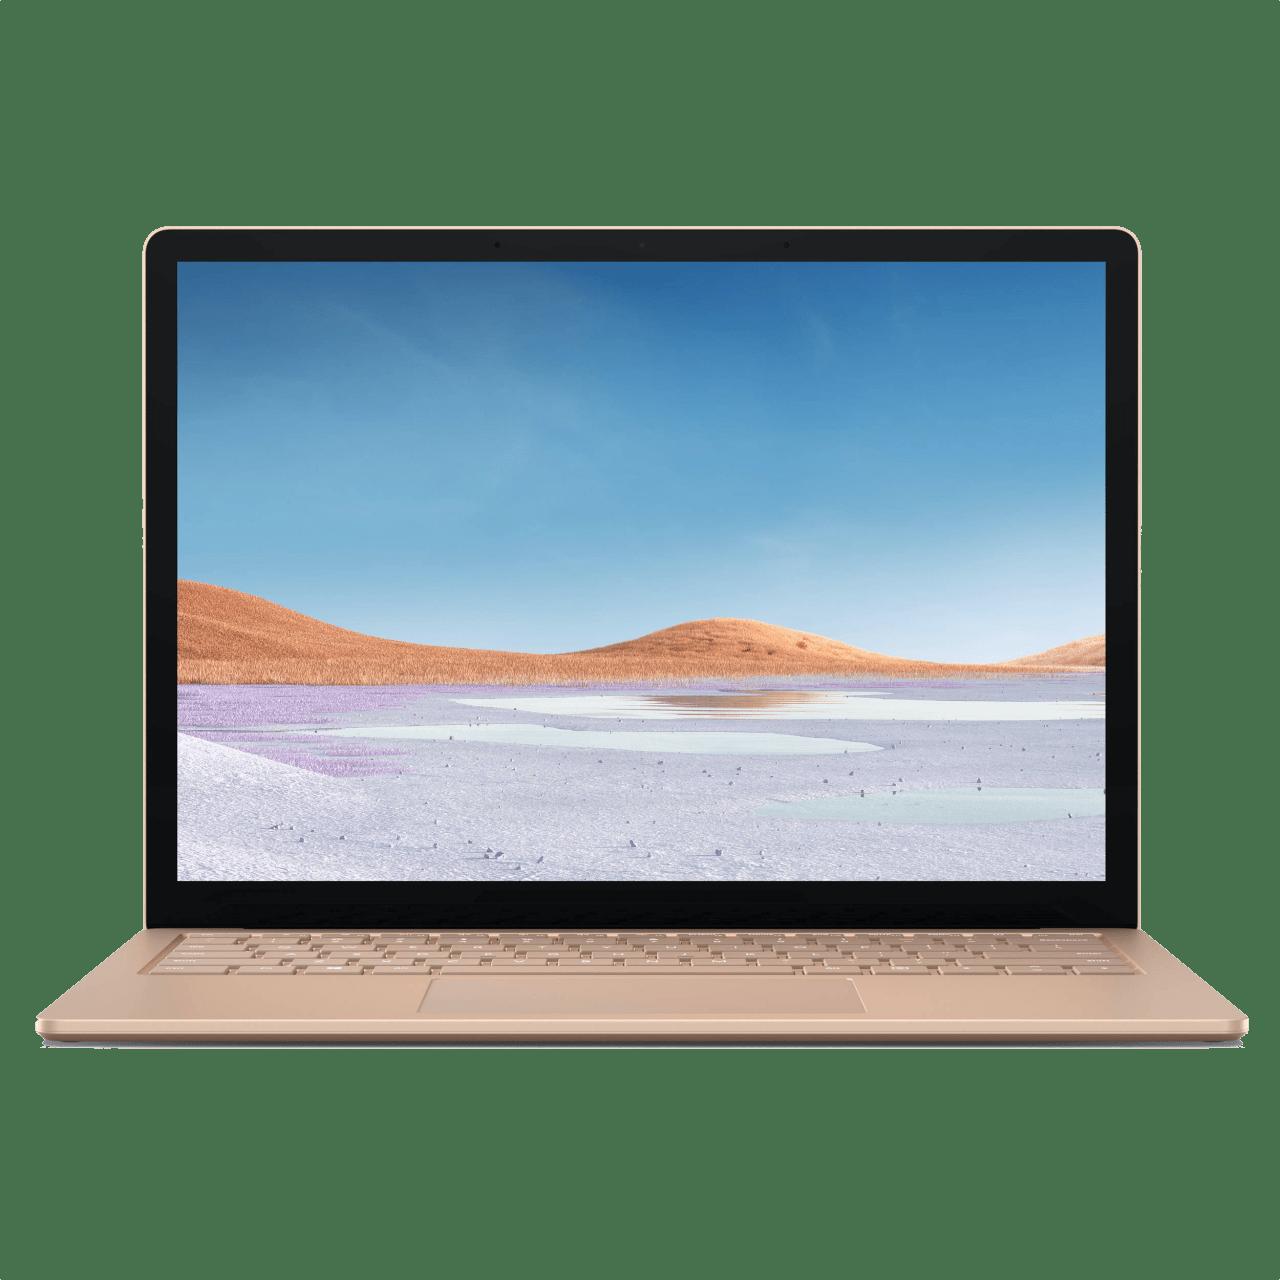 Sandstone (Metal) Microsoft Surface Laptop 3.1